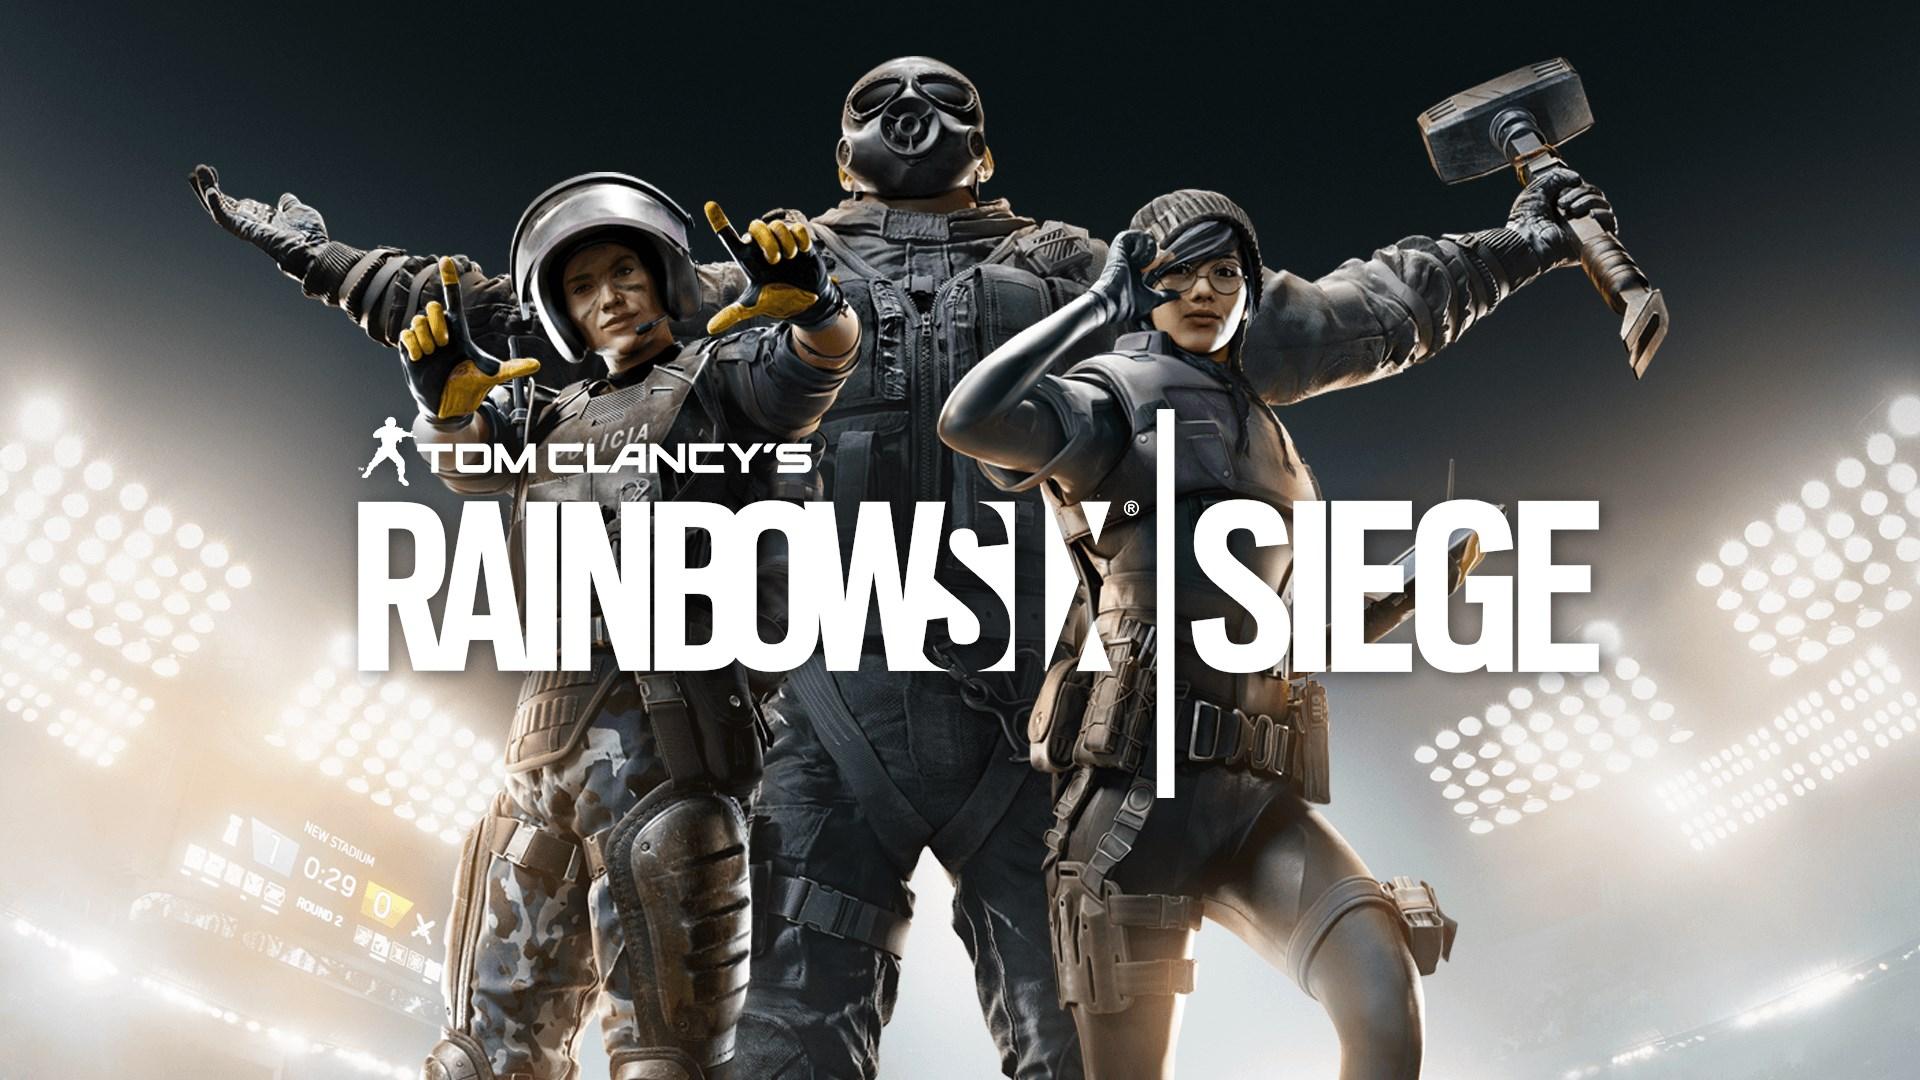 https://www.spiritgamer.fr/wp-content/uploads/2020/05/Tom-Clancy%E2%80%99s-Rainbow-Six-Siege.jpg